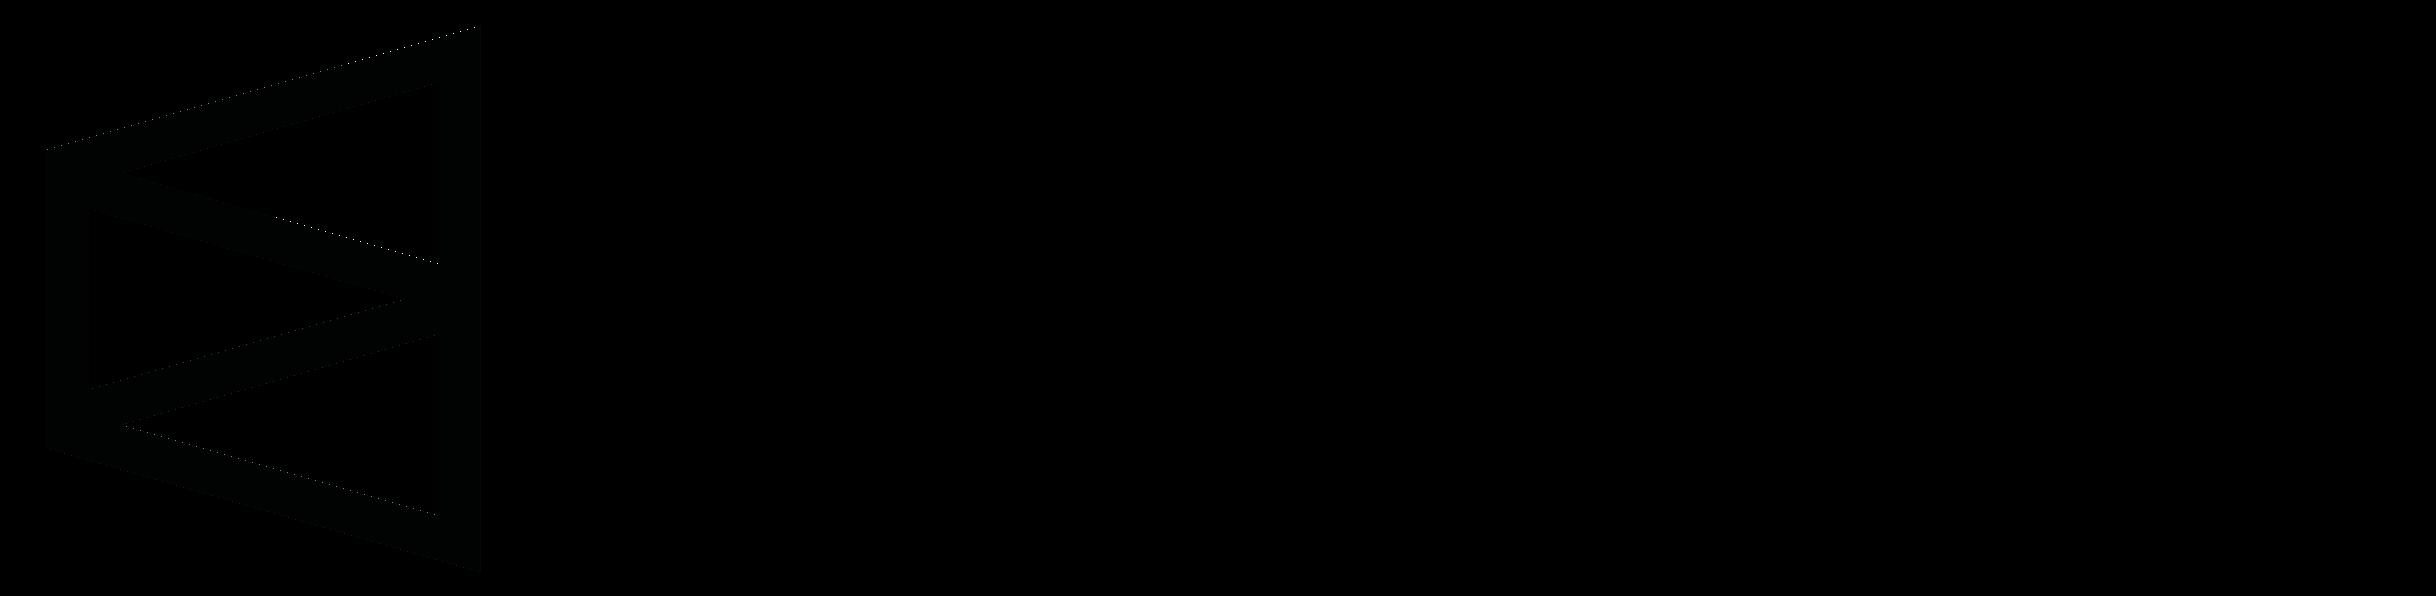 Polymarket